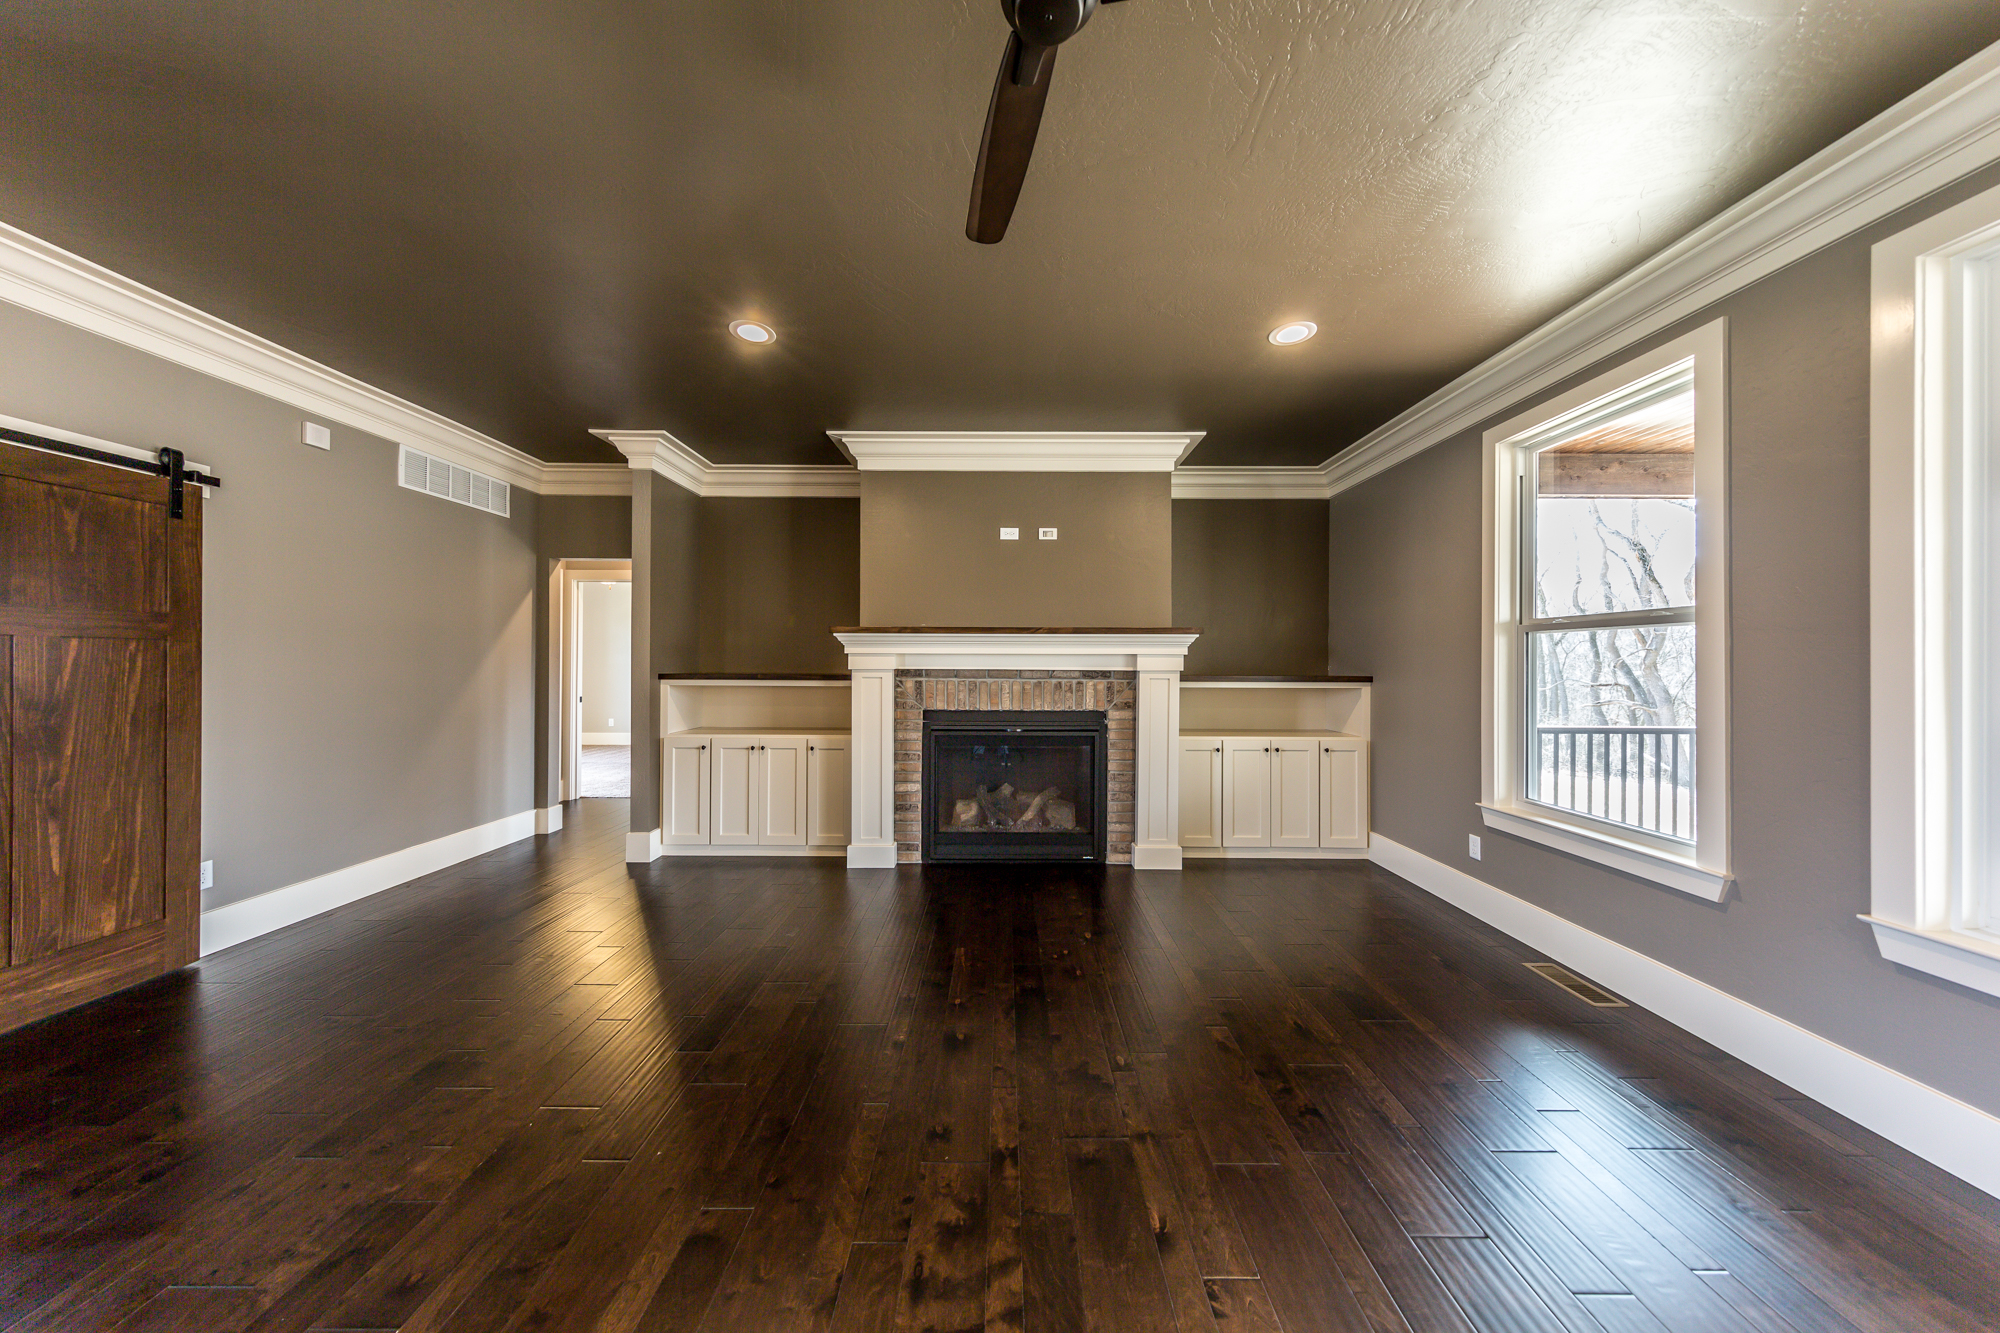 New-Construction-For-Sale-Bethel-Ridge-Farms-Scott-AFB-Illinois-5.2.jpg